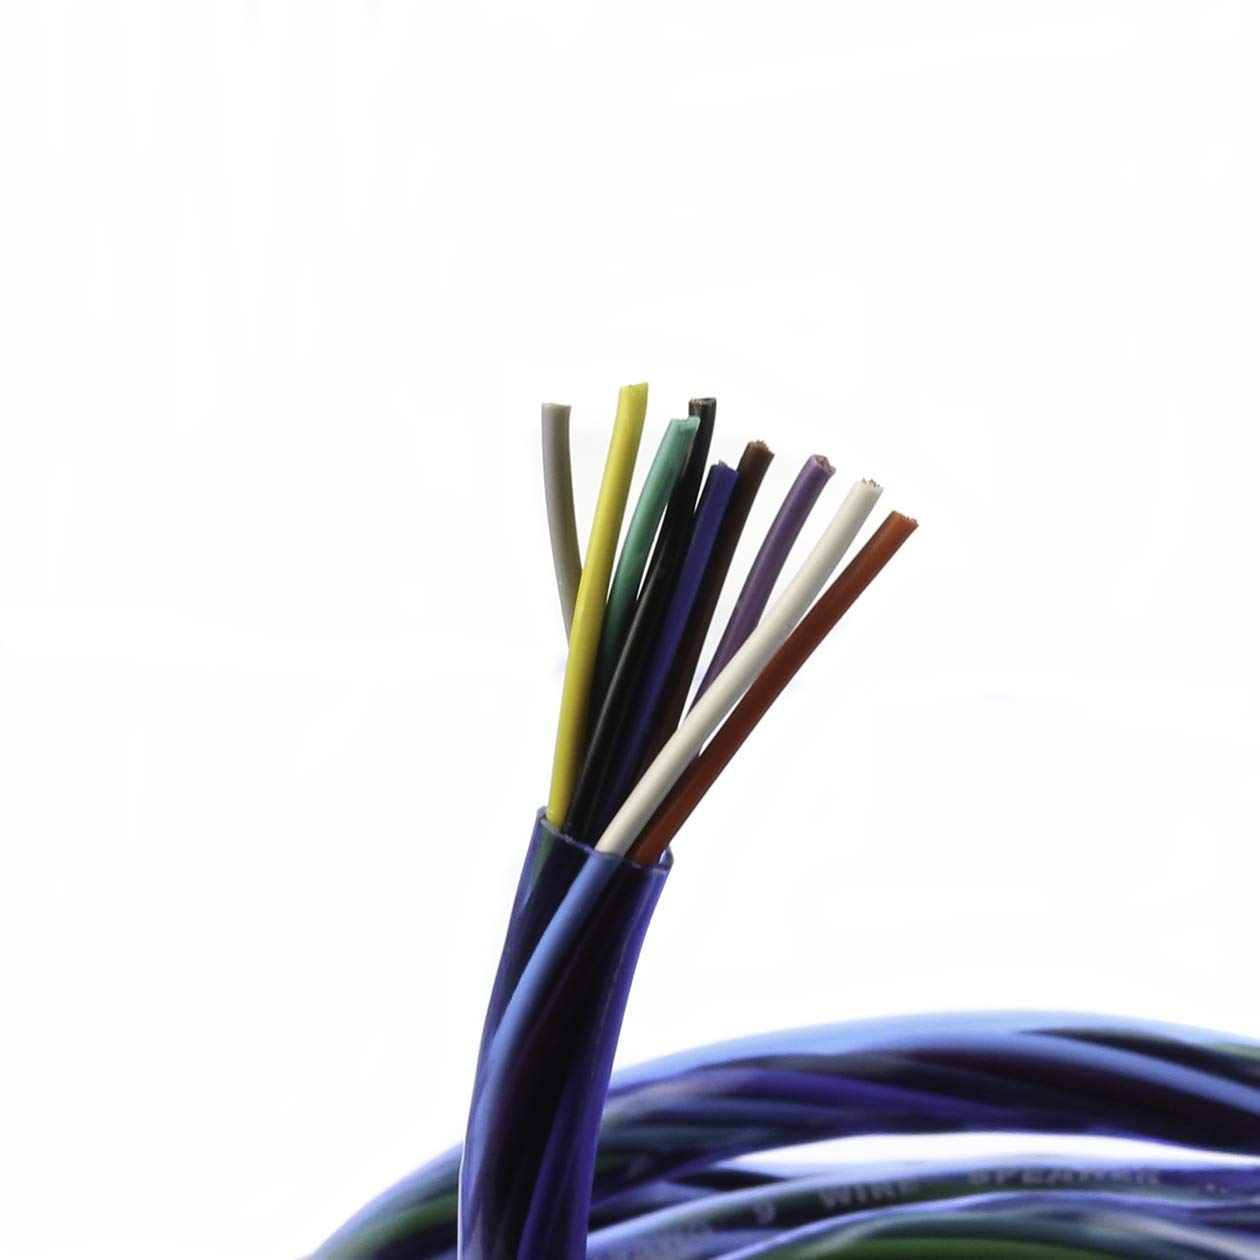 25 FT VOODOO 18 AWG Gauge 9 Conductor Speed Blue Wire Speaker Trailer Copper Stranded